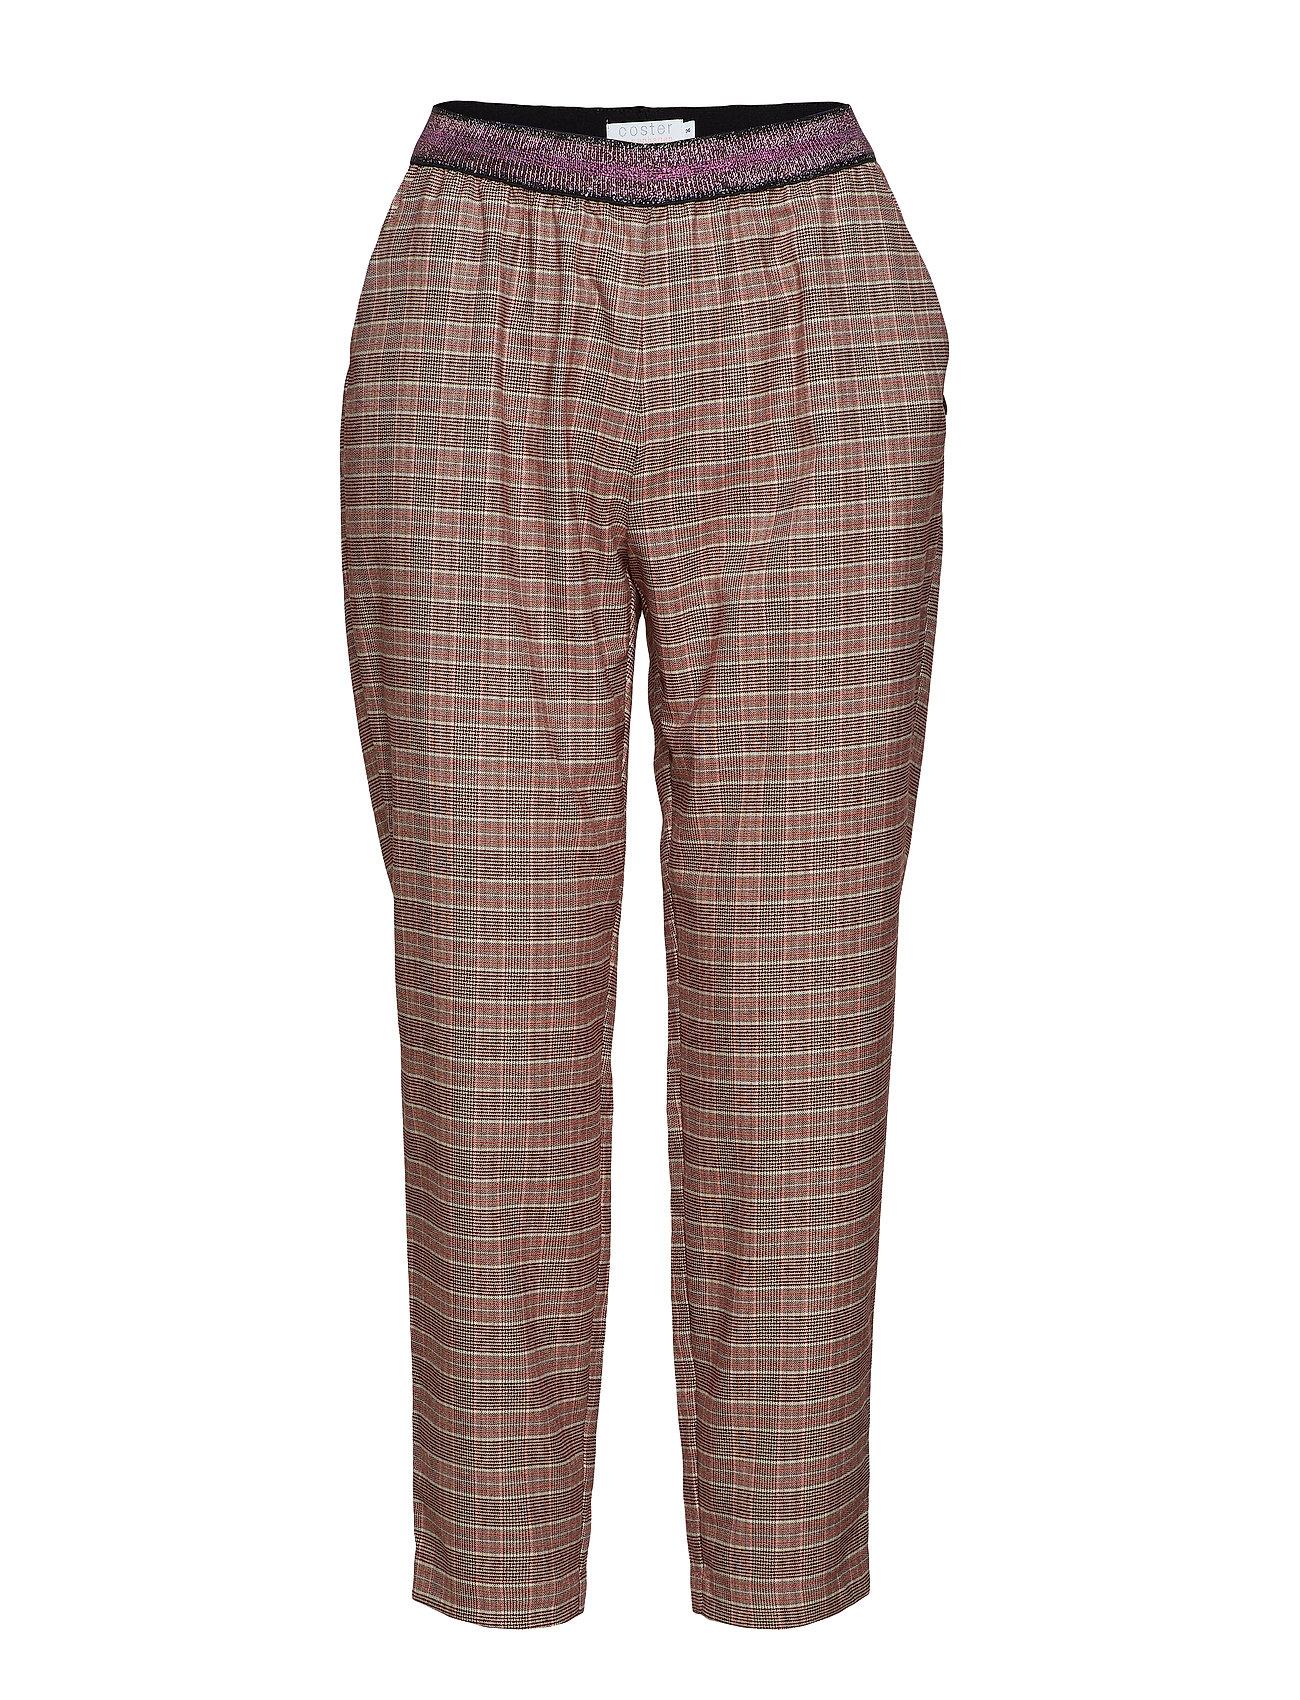 Pants In Checks W. Lurex Tape - Coster Copenhagen